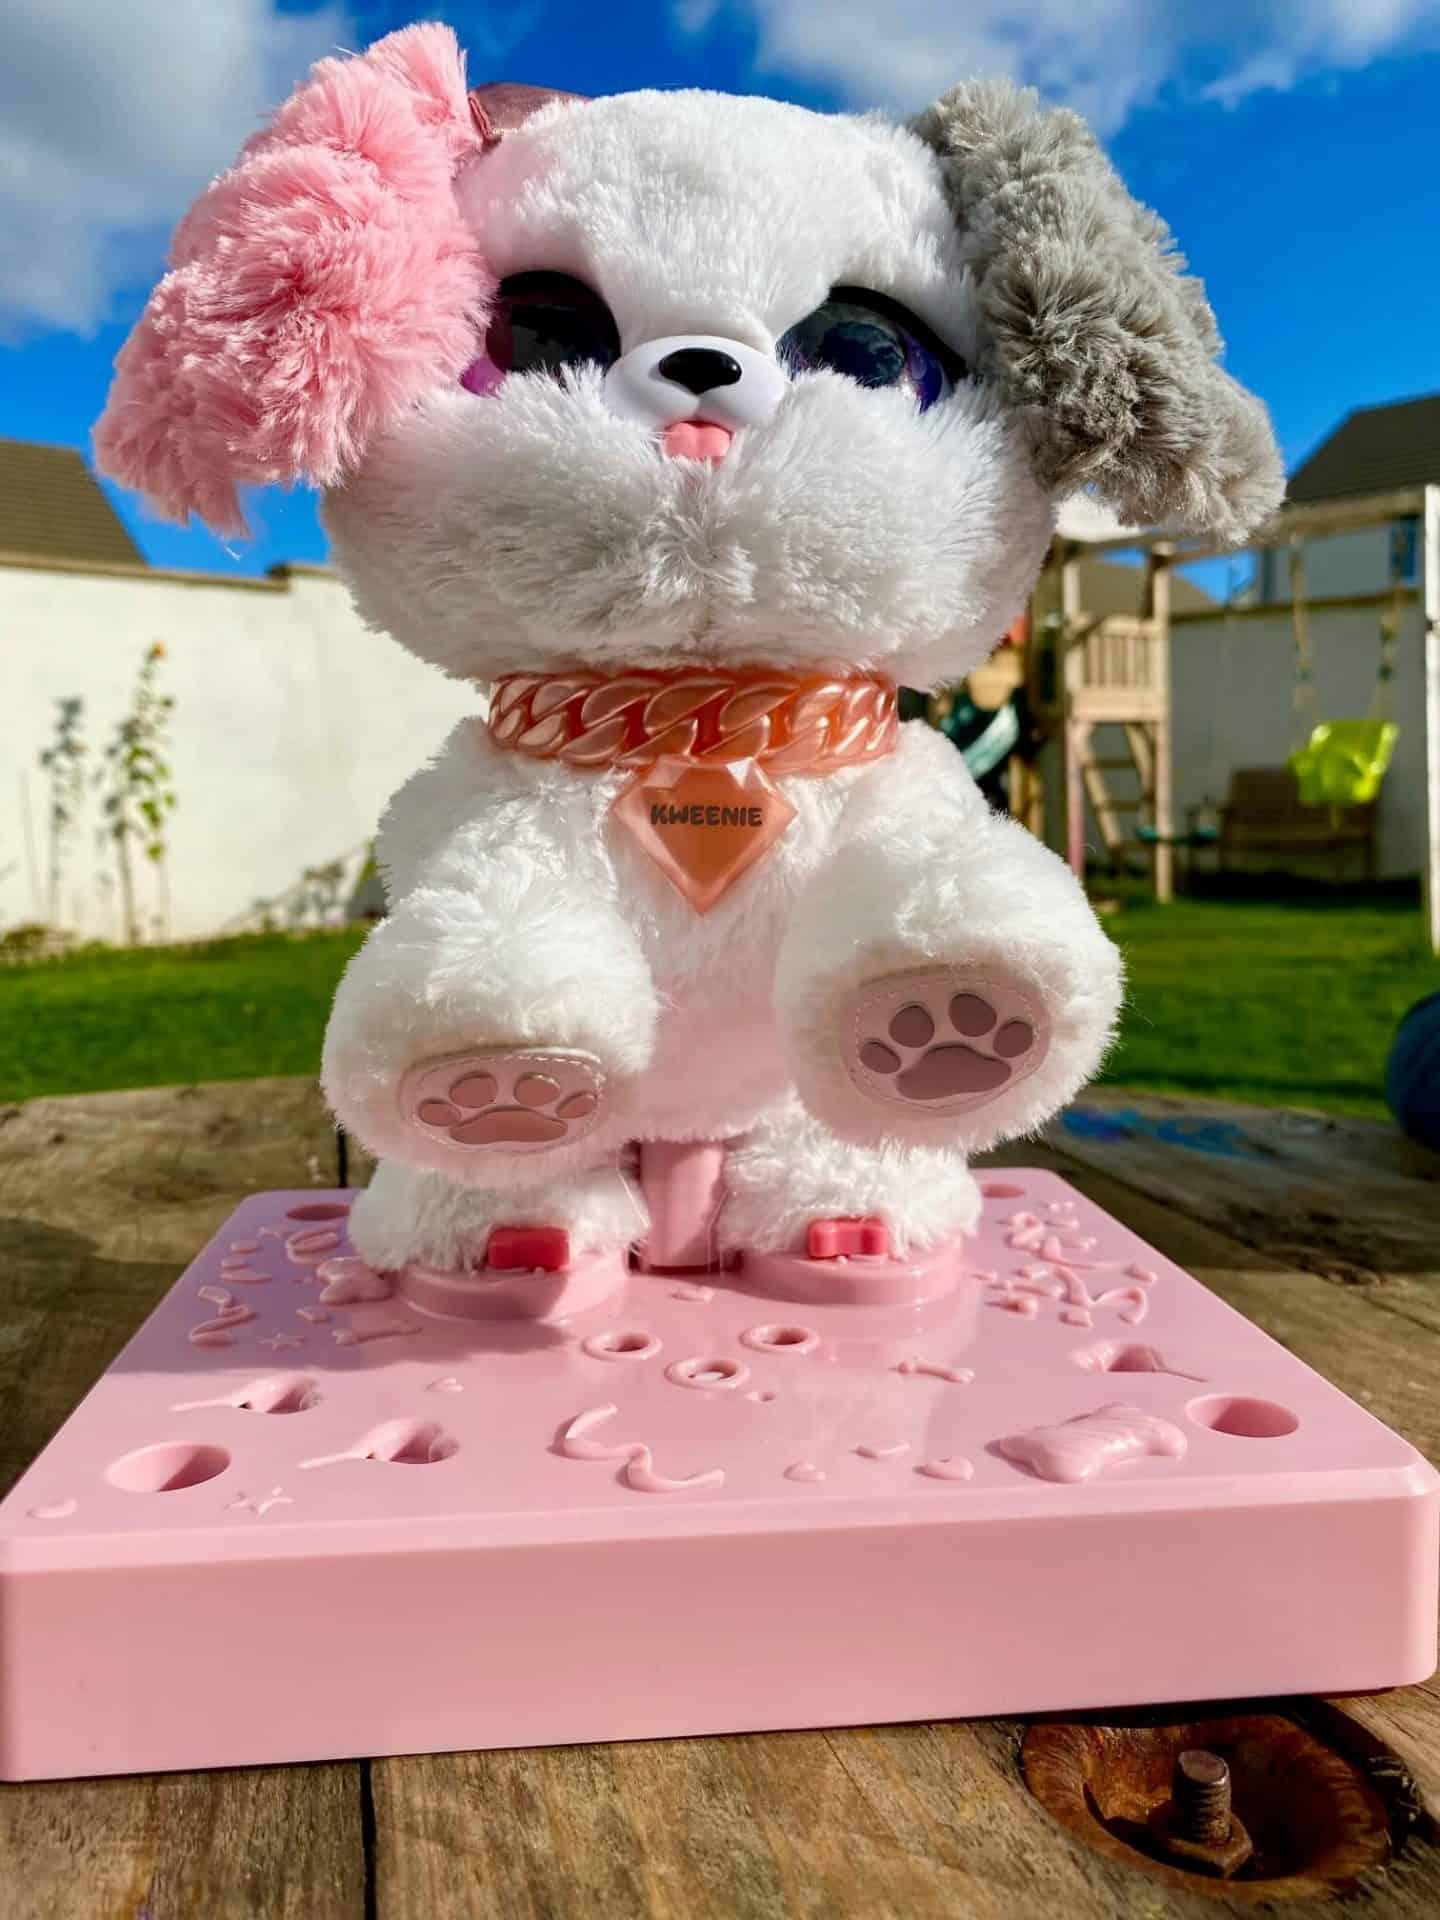 Present Pets Kweenie on her platform